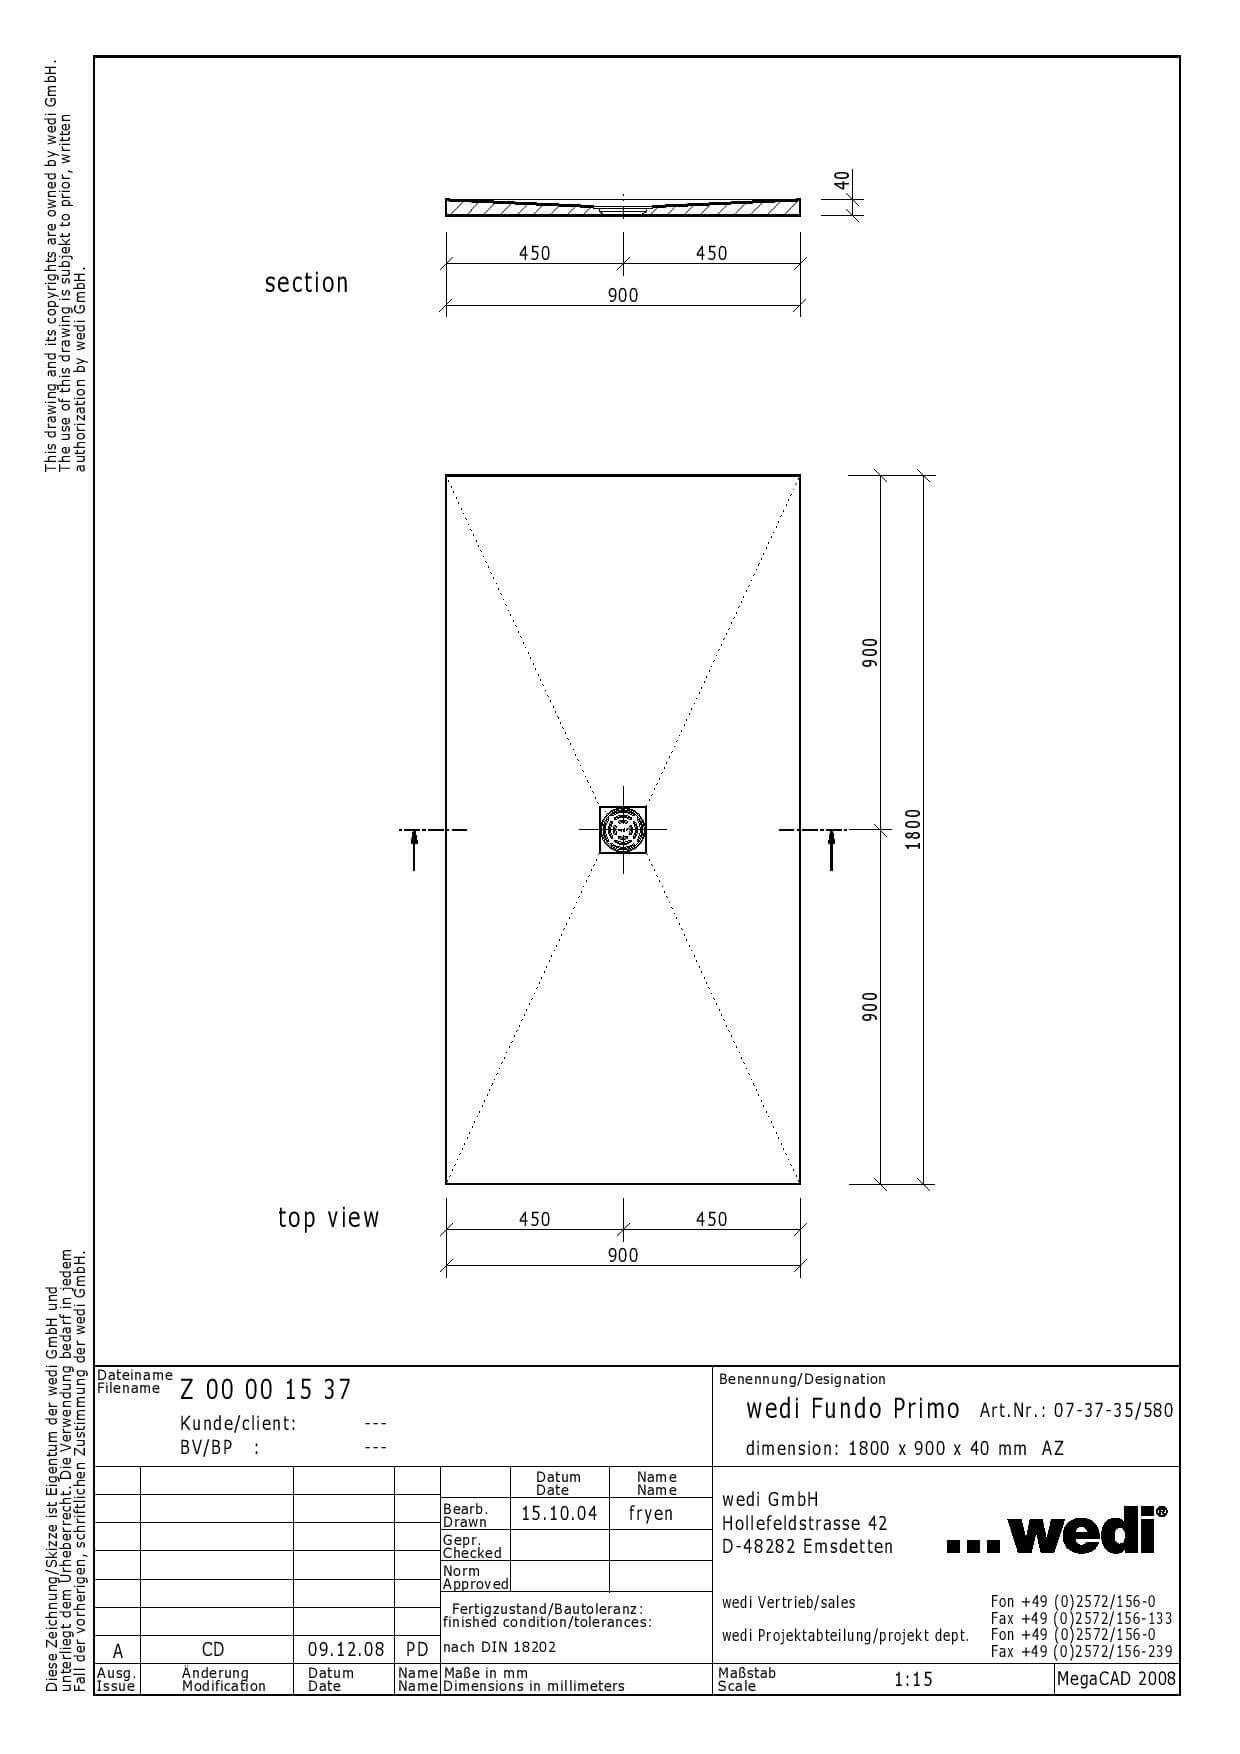 Receveur carreler rectangulaire fundo primo 180x90x4 cm for Epaisseur receveur a carreler